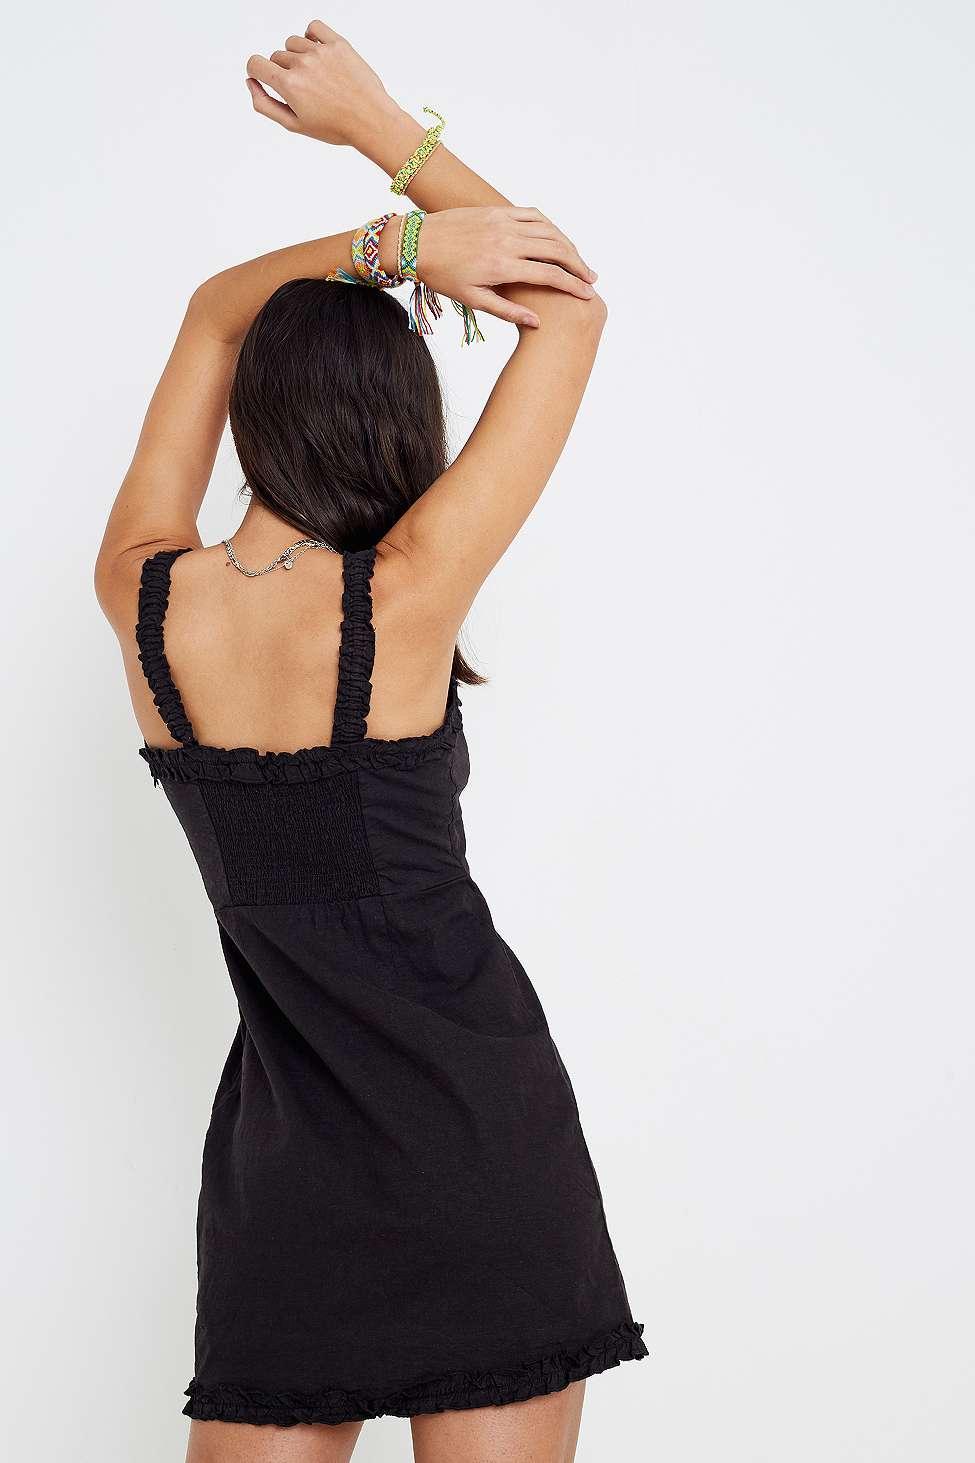 5bbfade5637 Urban Outfitters - Uo Wren Black Linen Ruffle Mini Dress - Womens Xs -  Lyst. View fullscreen